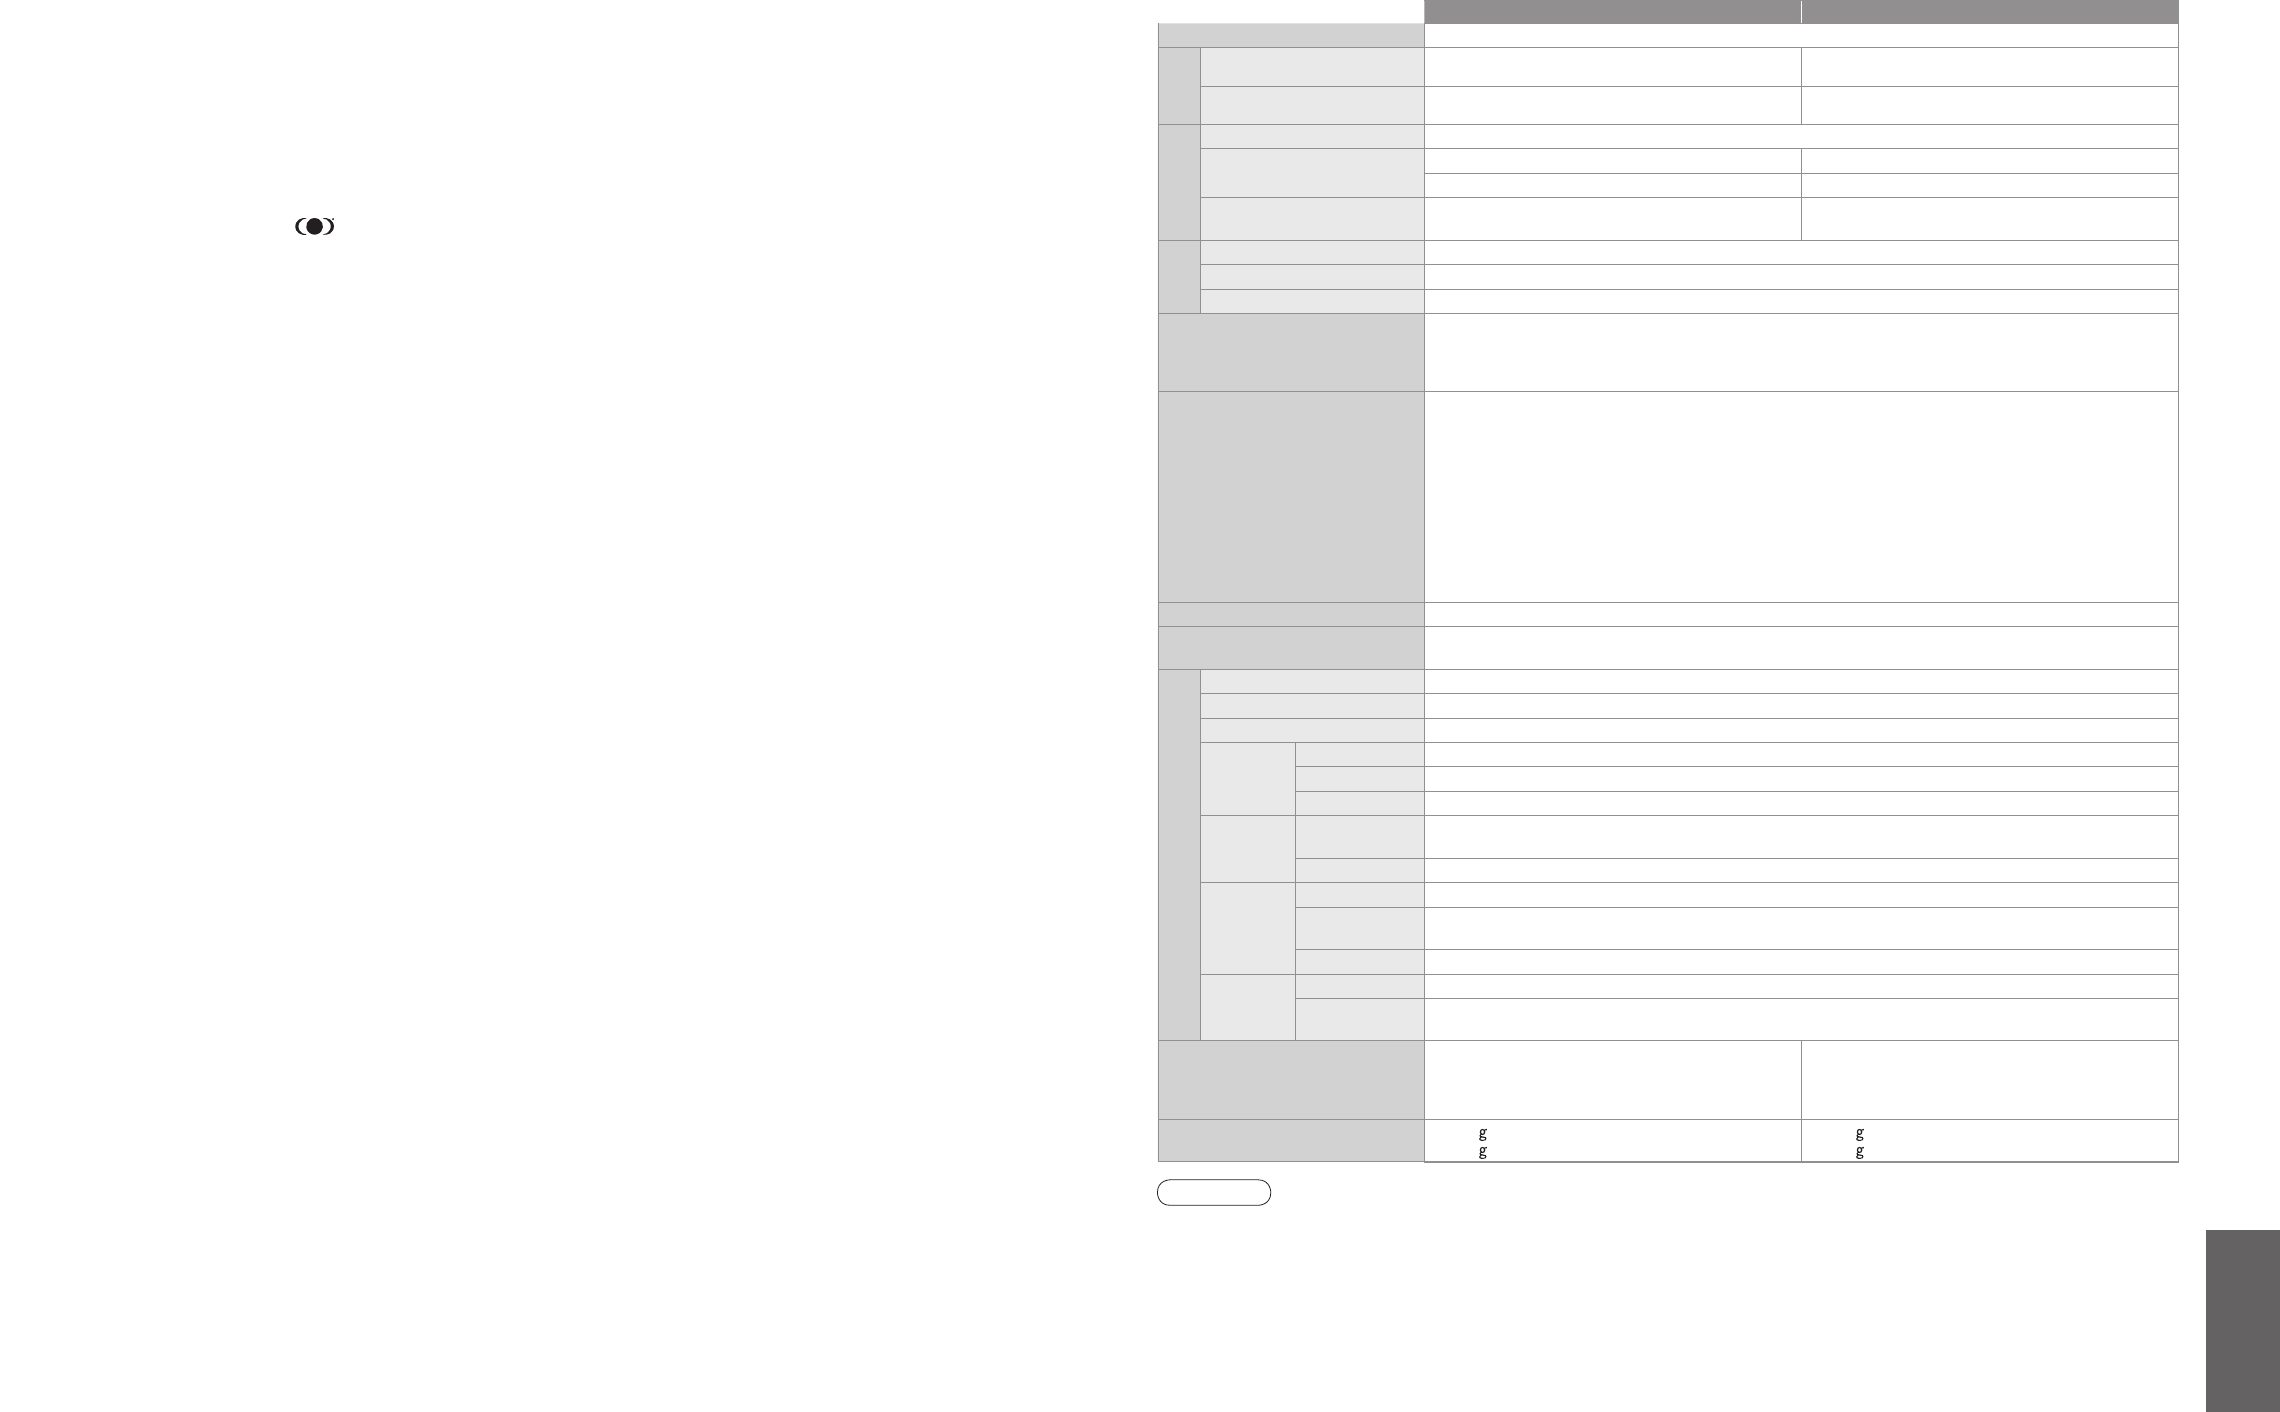 Handleiding Panasonic TH-42PV70 (pagina 20 van 22) (Deutsch)